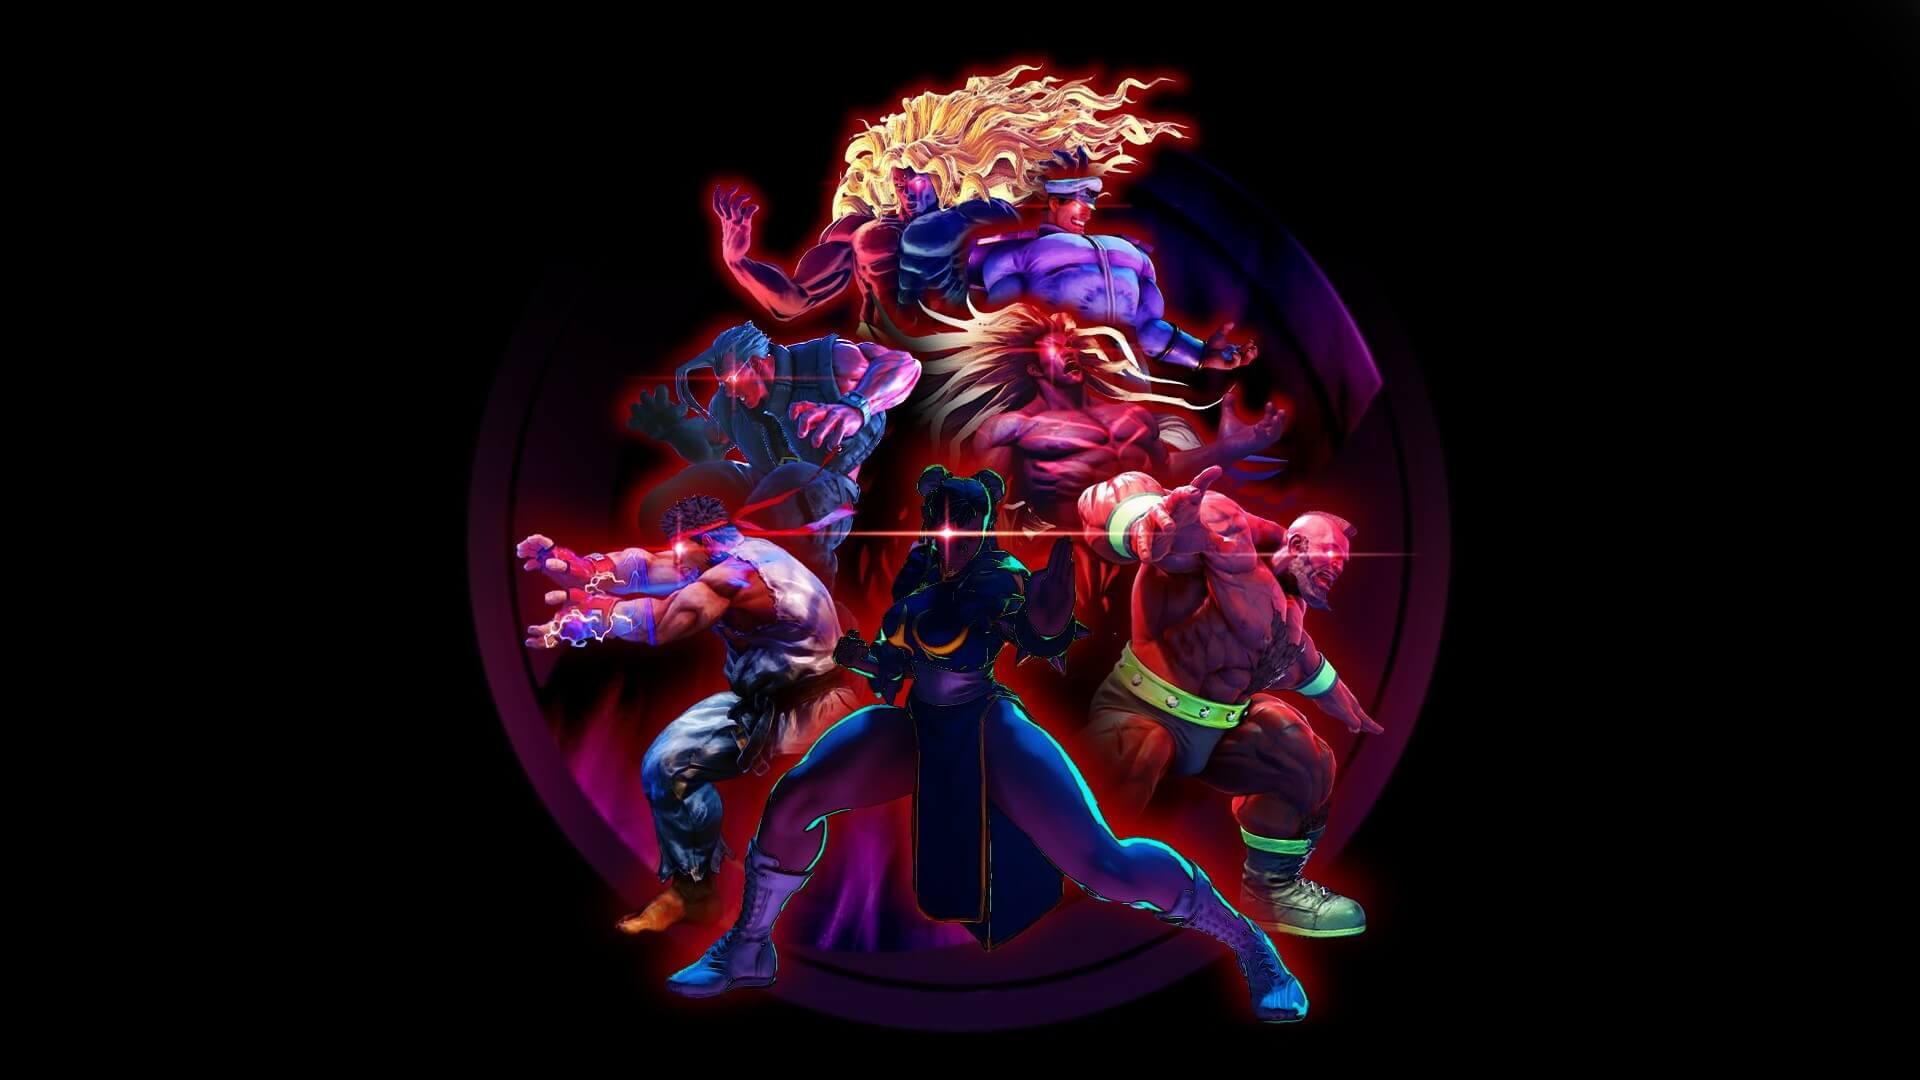 Boss Rush arrives in Street Fighter V: Type Arcade today